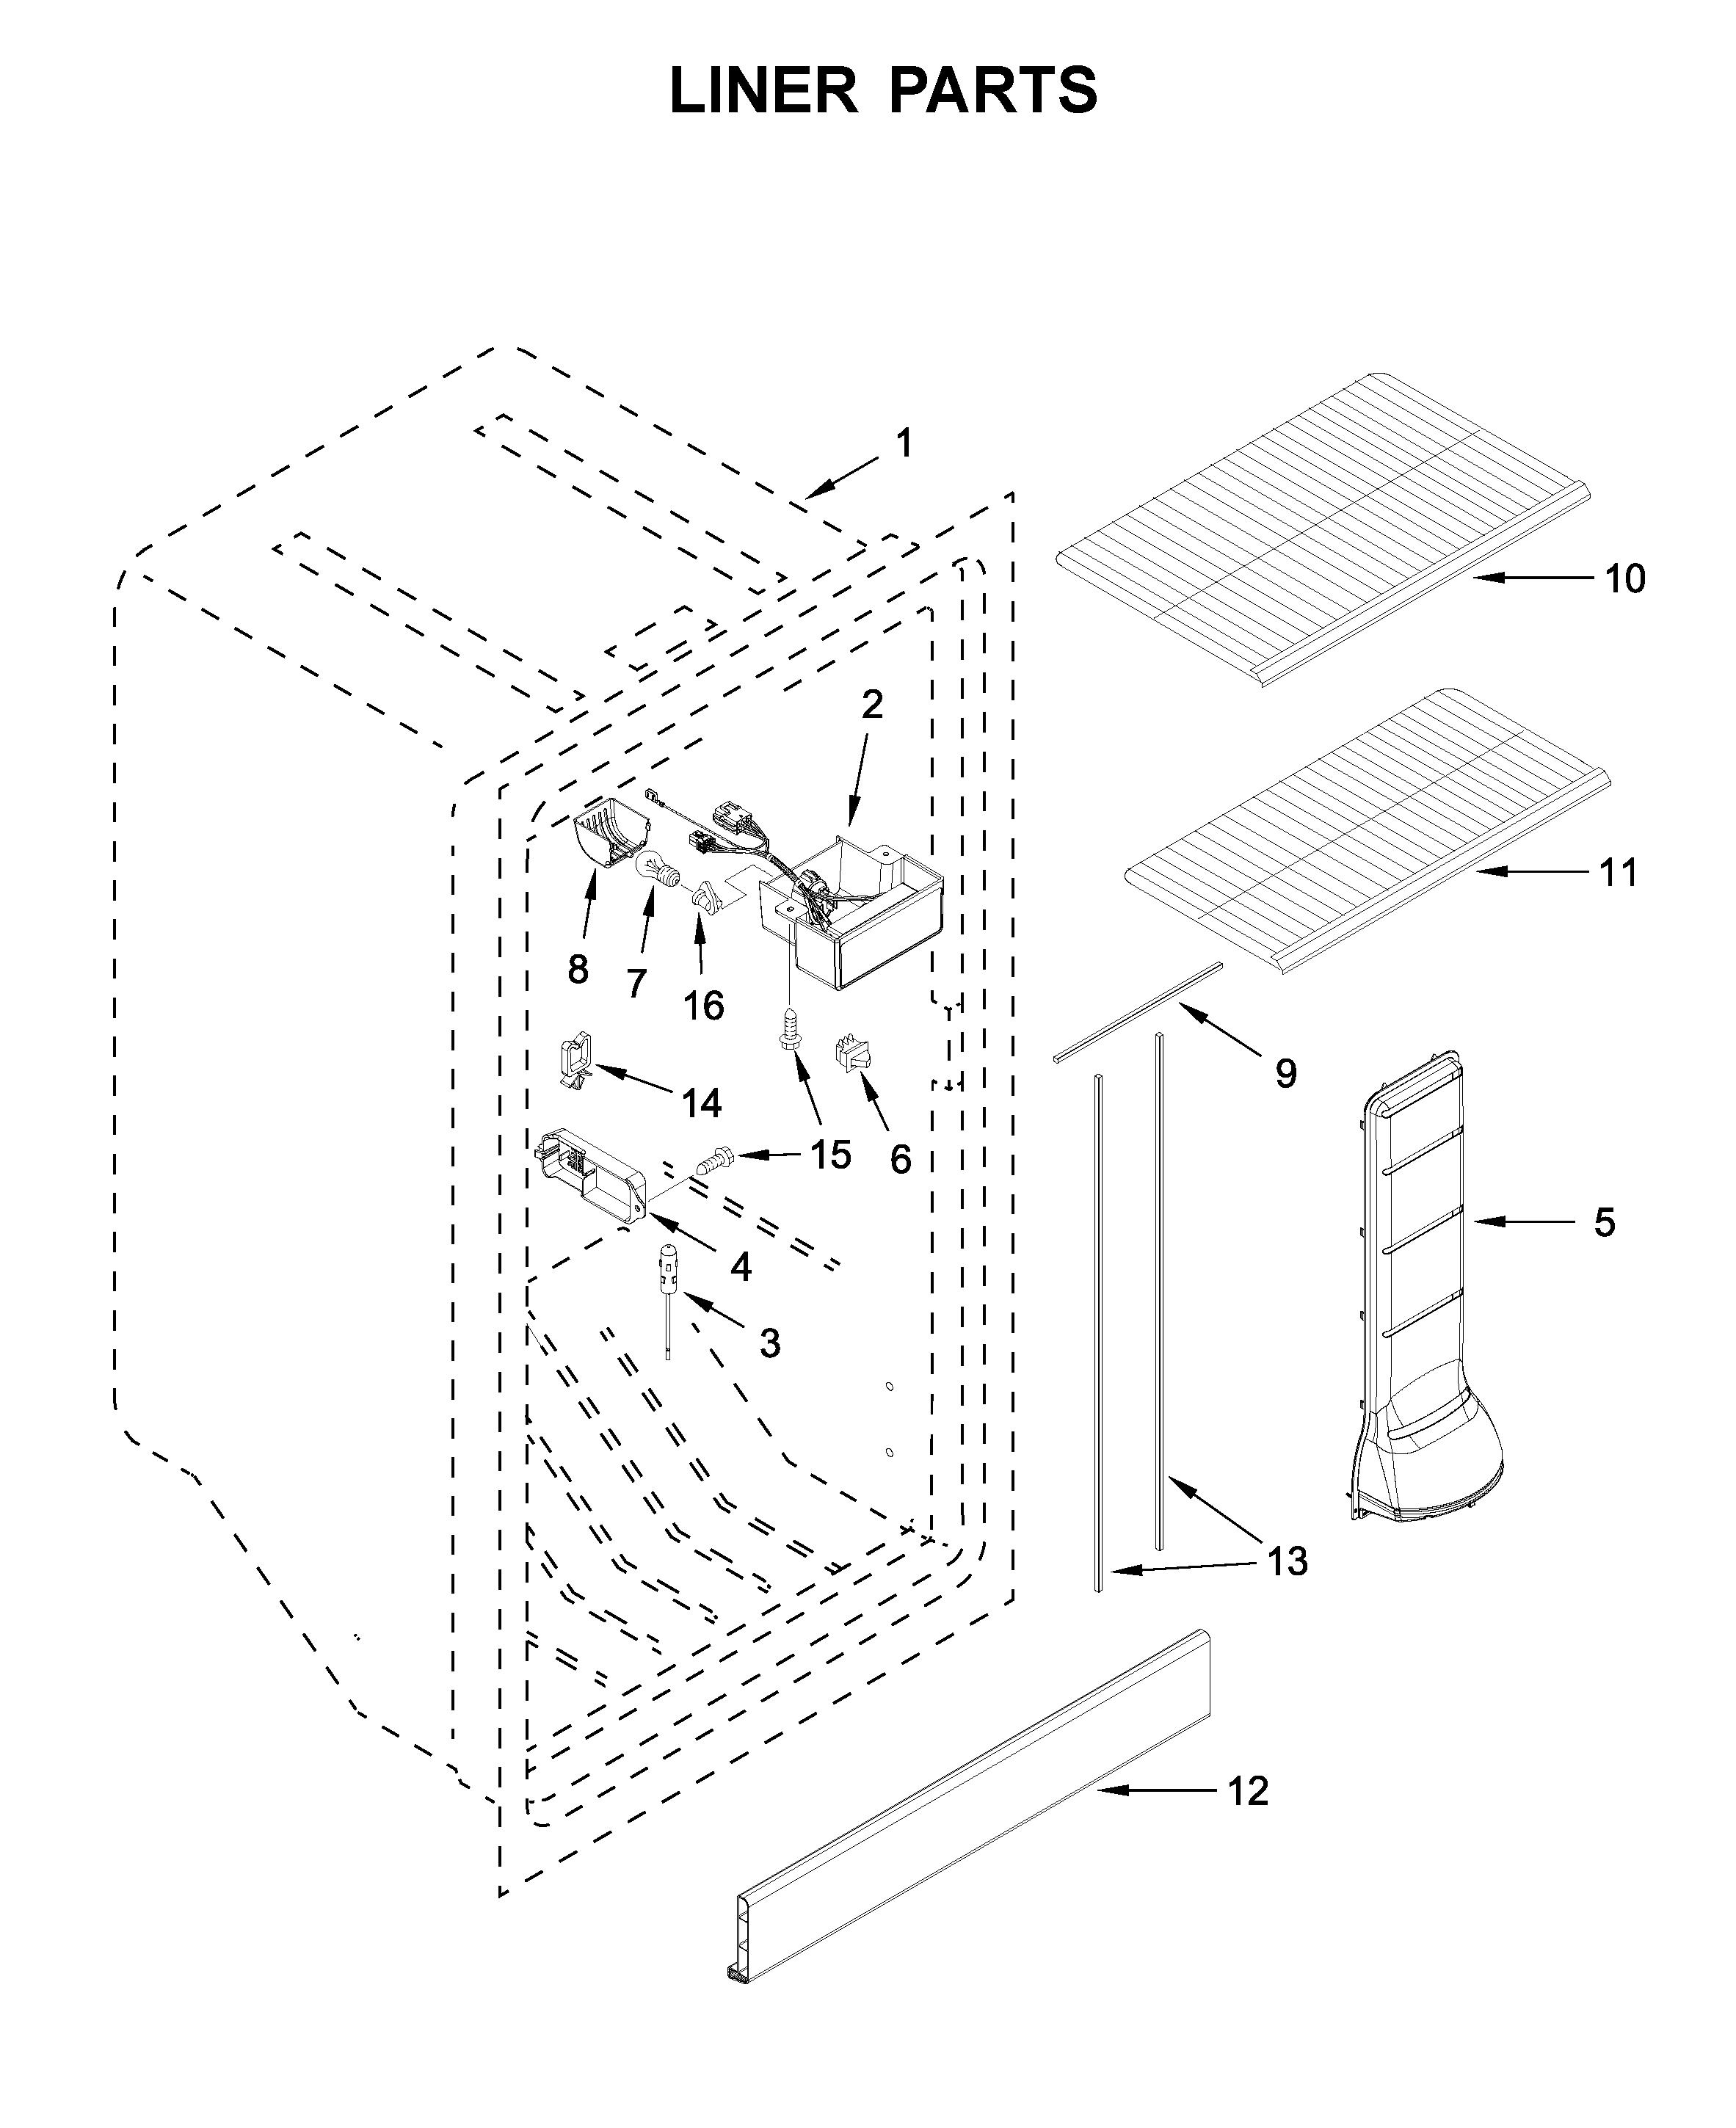 Amana  Upright Freezer  Liner parts